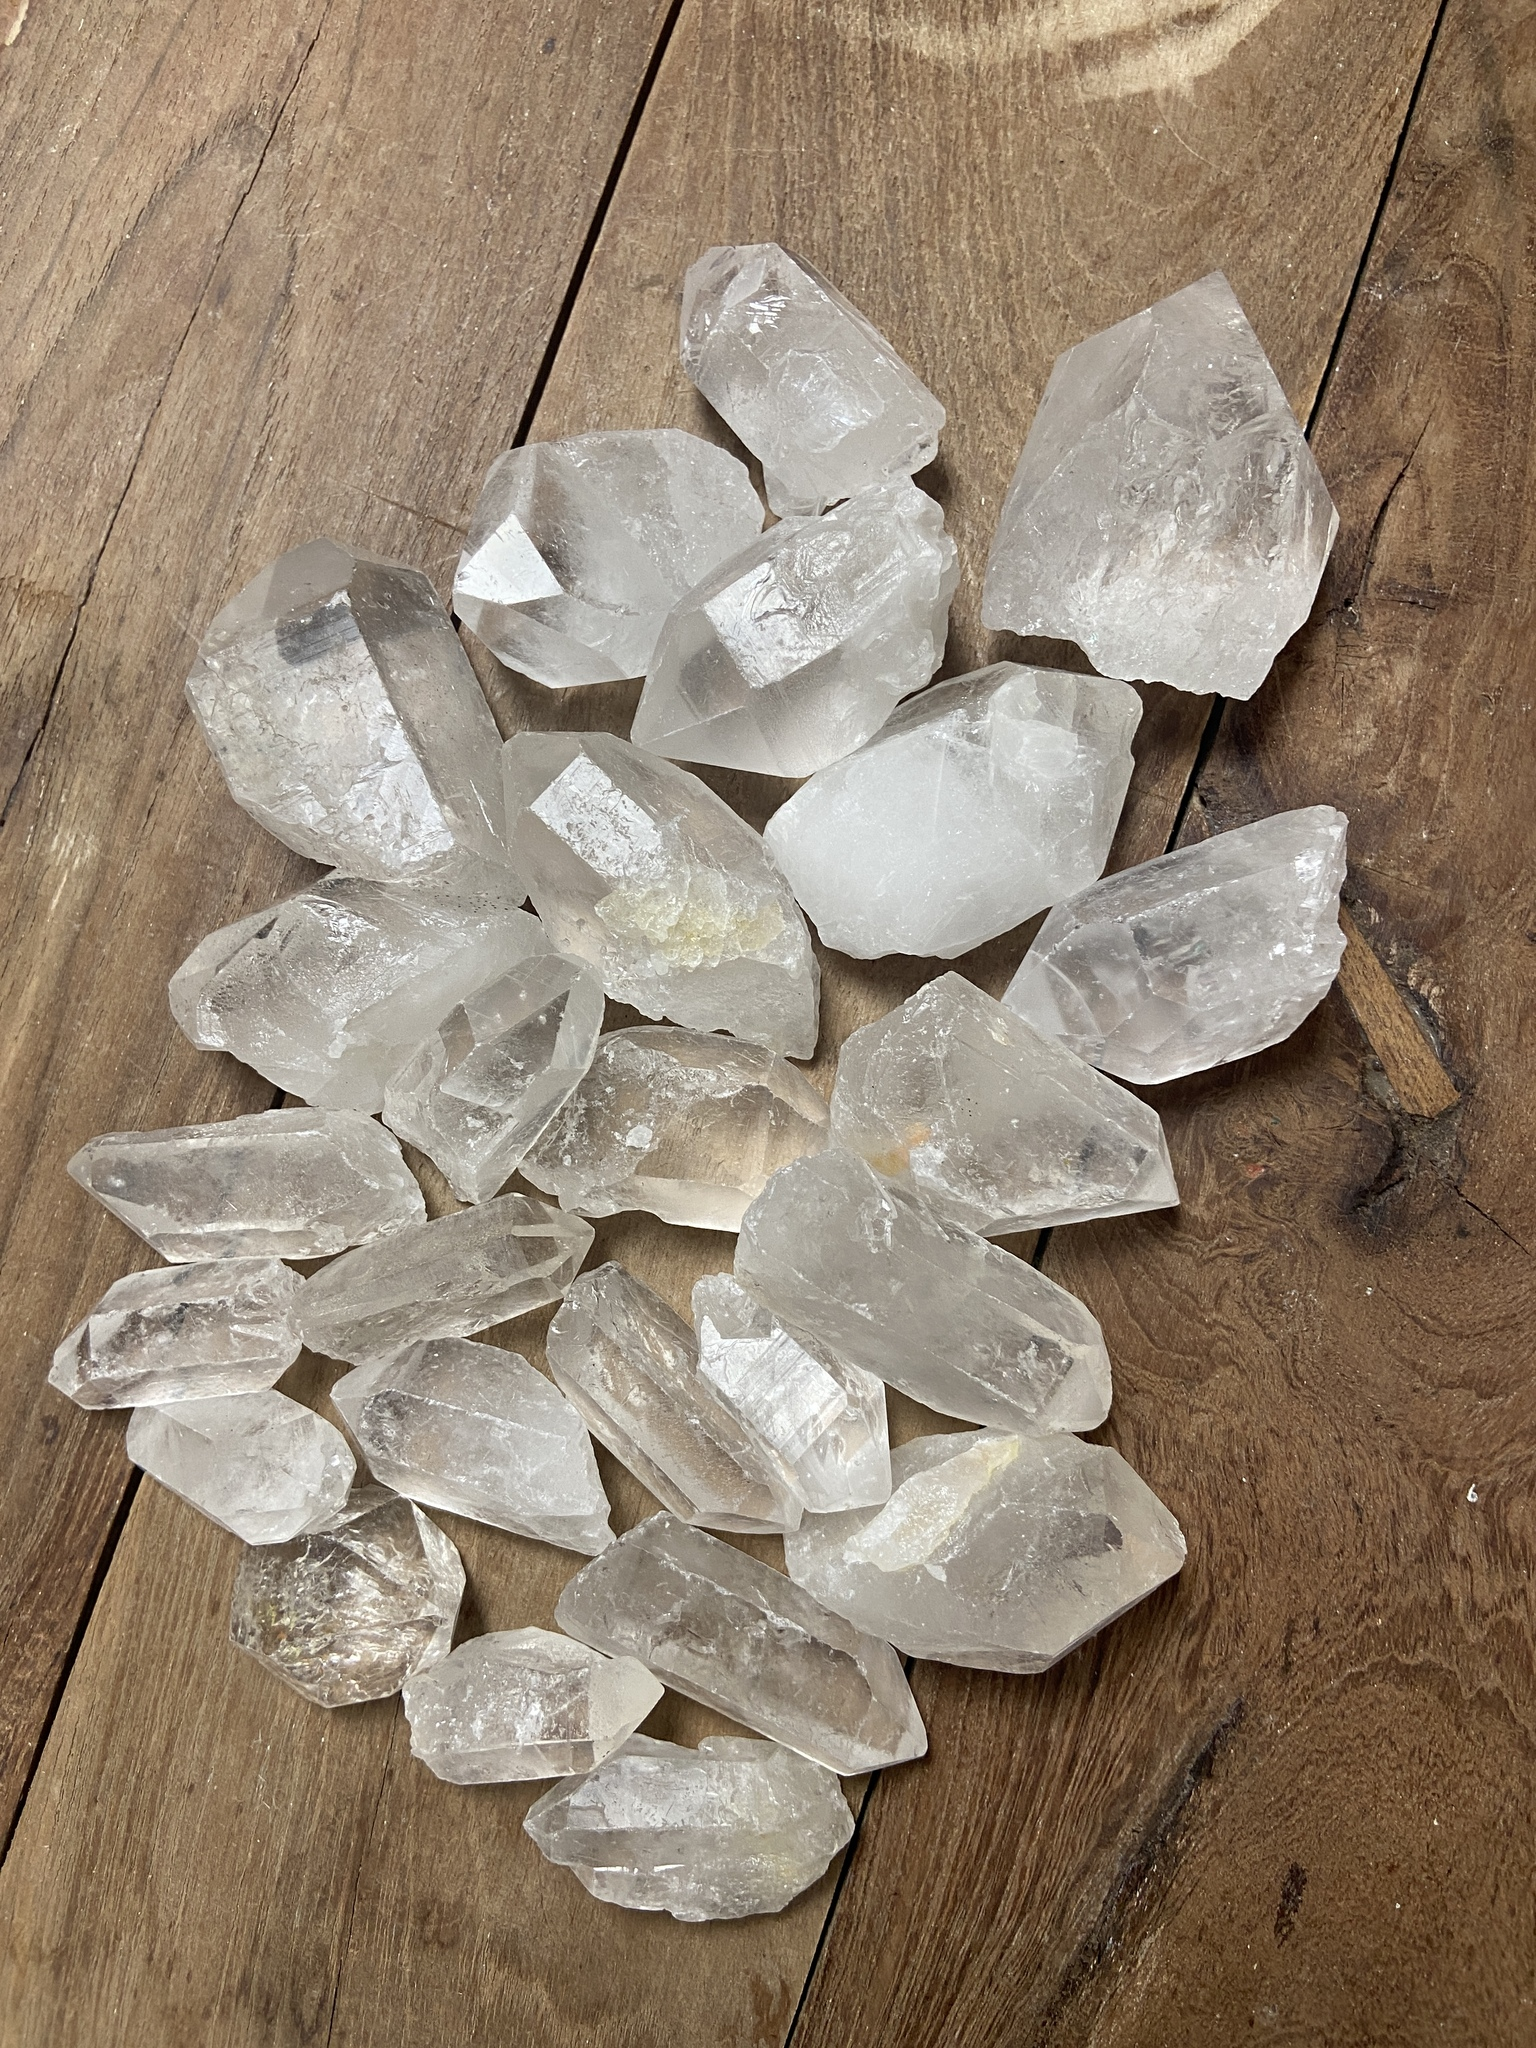 Bergkristall Spets